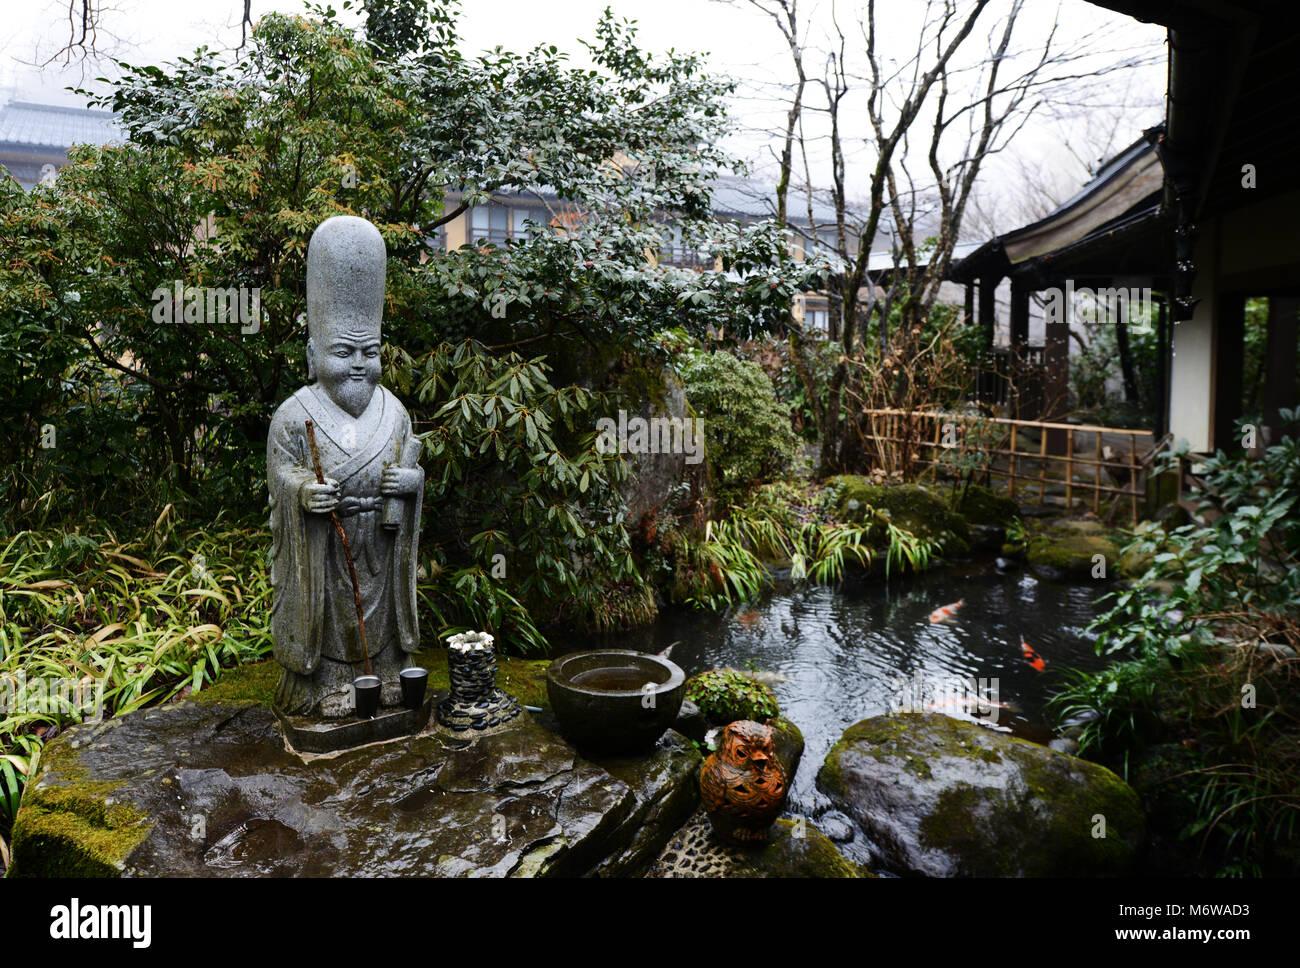 Der Schöne Garten Im Yamabiko Ryokan In Kurokawa Onsen, Japan.